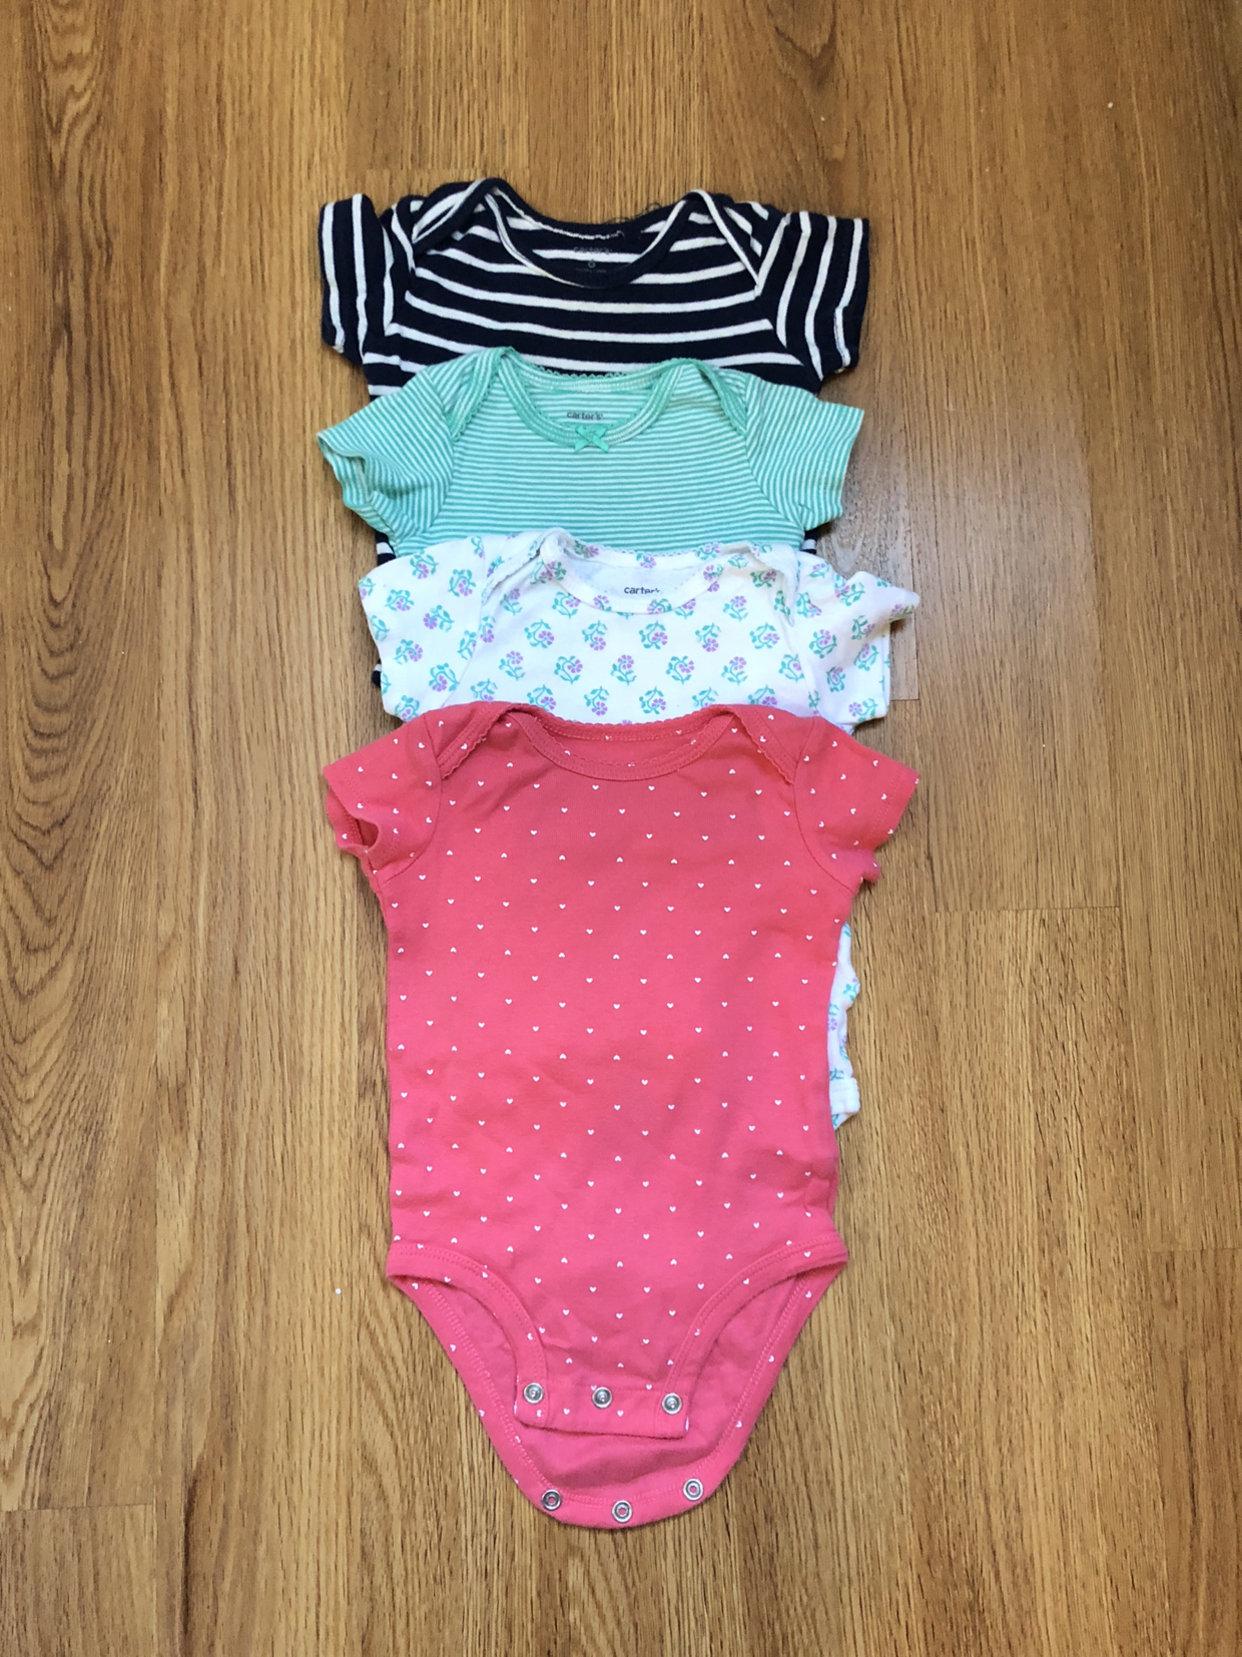 Girls in bodysuits pics Baby Girls Bodysuits Bundle